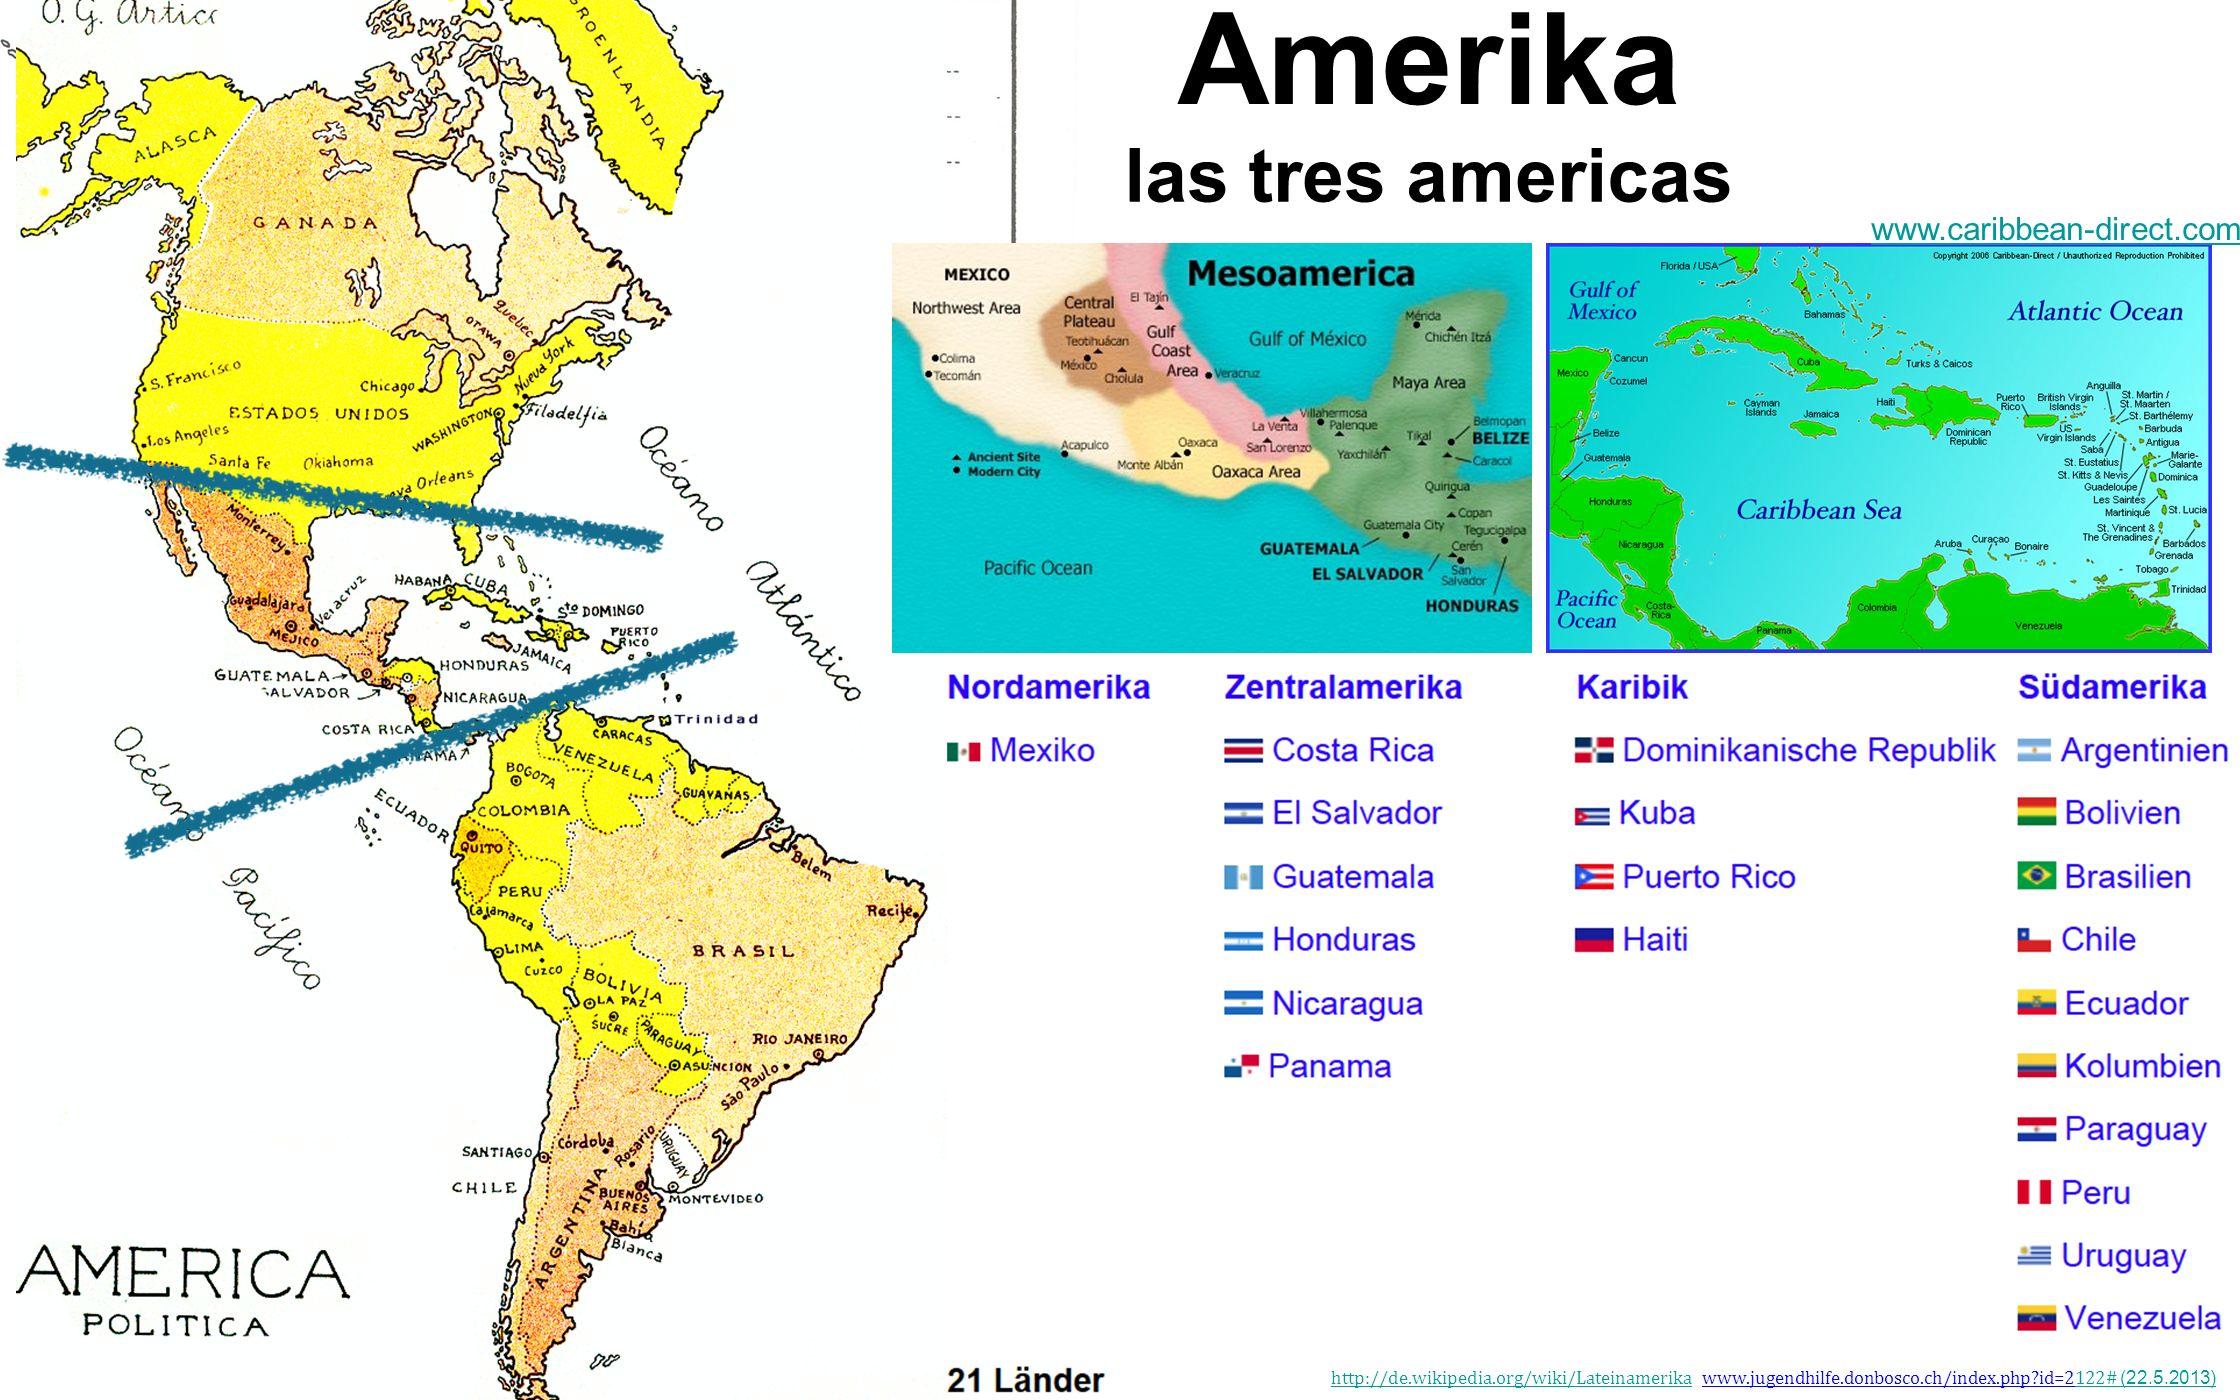 Amerika las tres americas www.caribbean-direct.com/